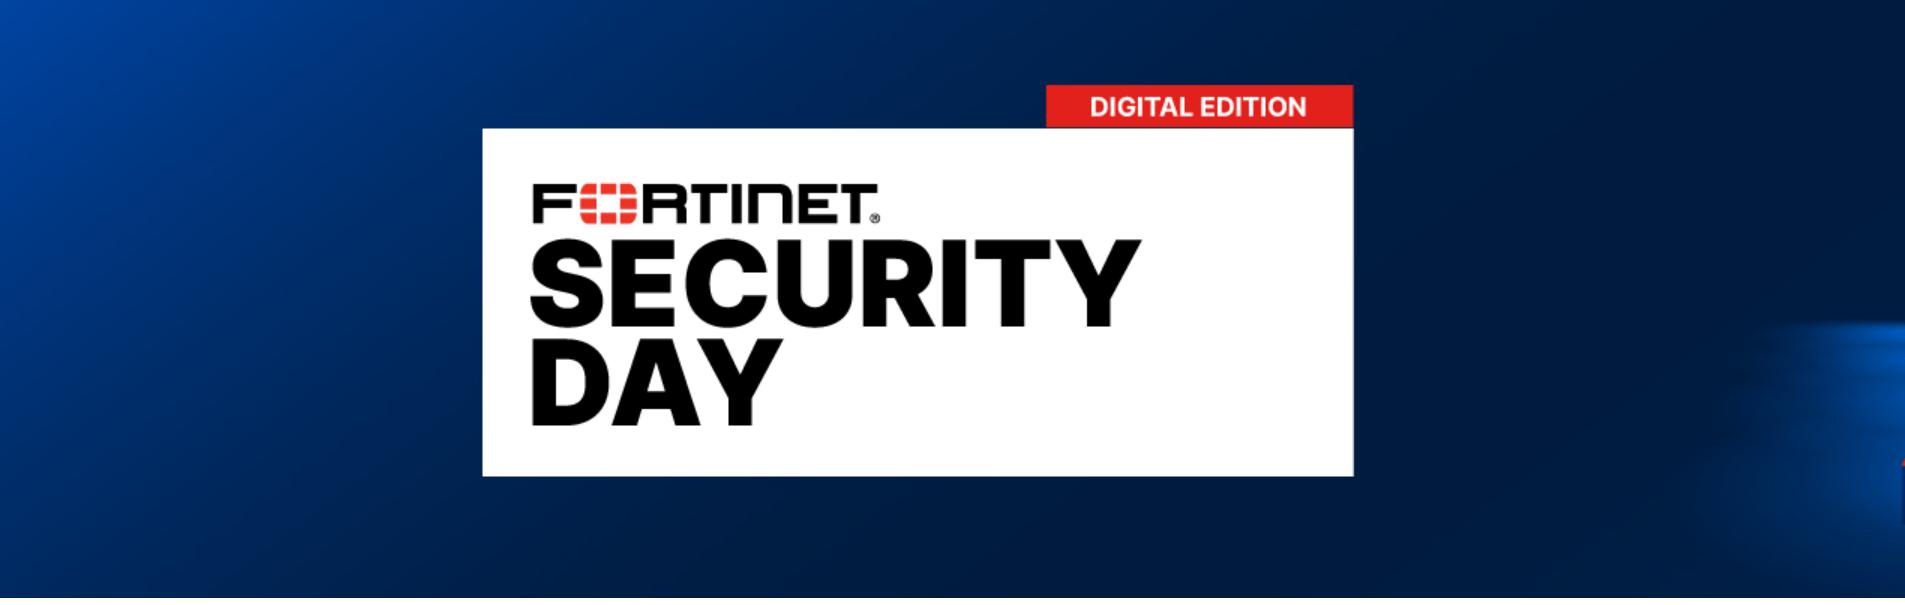 Securing the Digital World